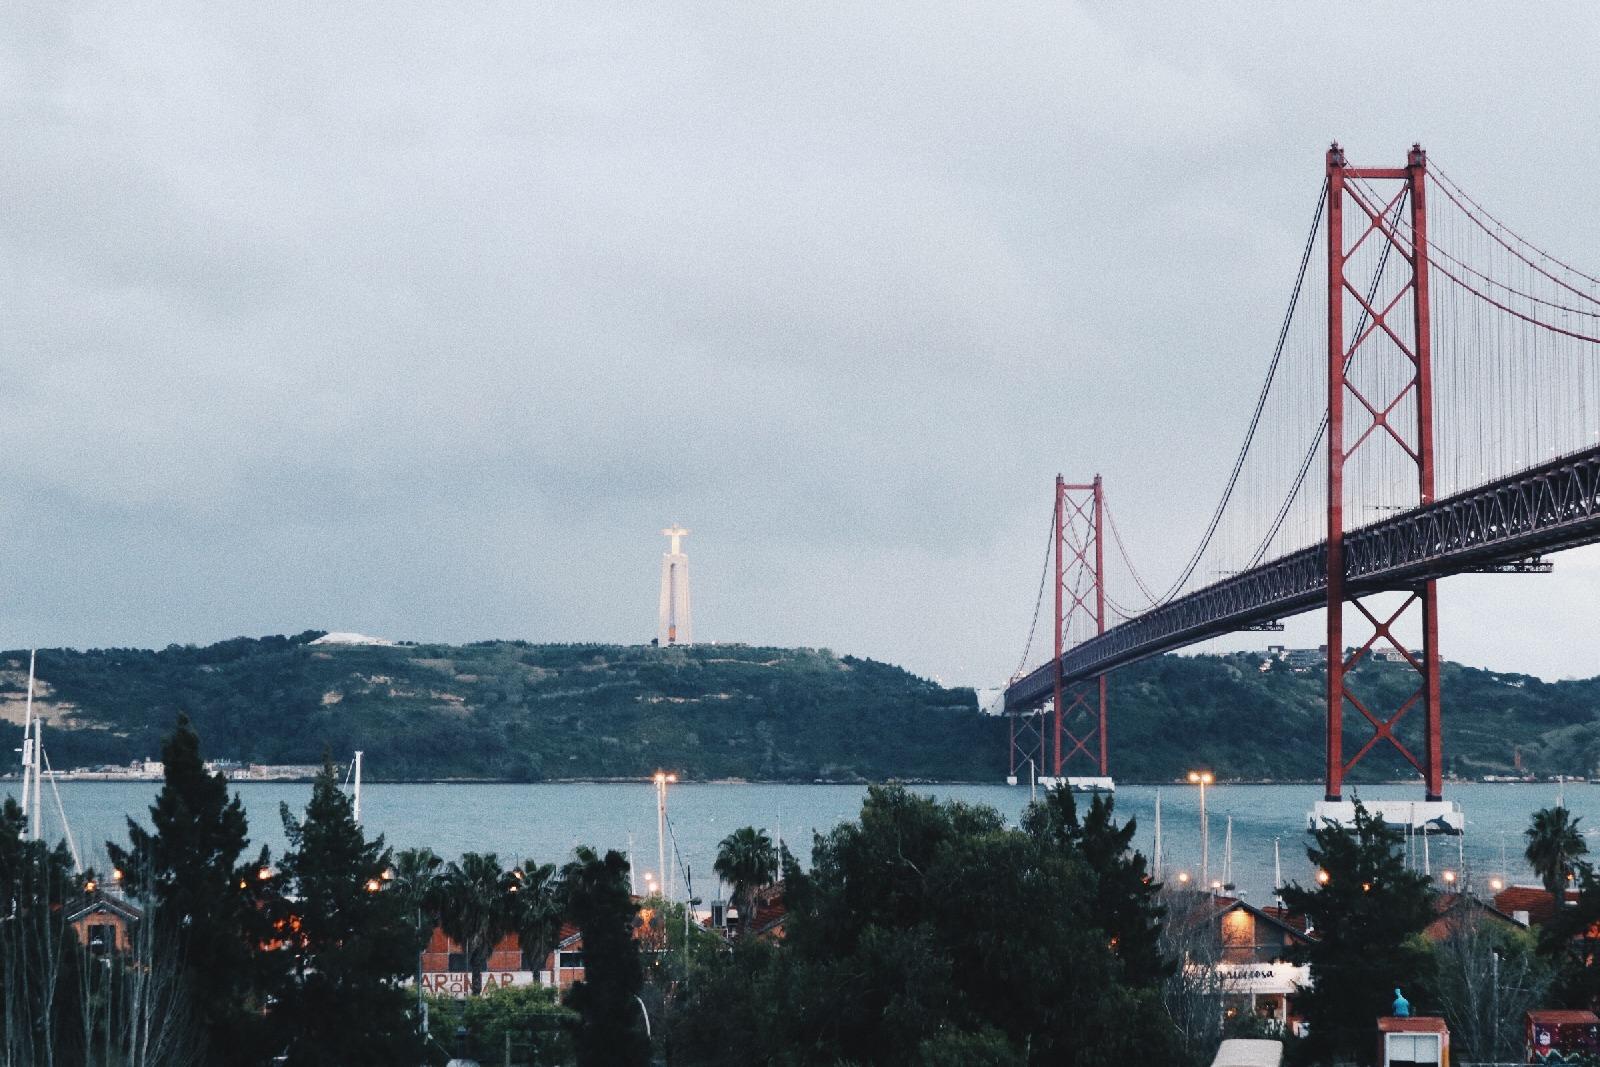 rio maravilha bridge in Lisbon